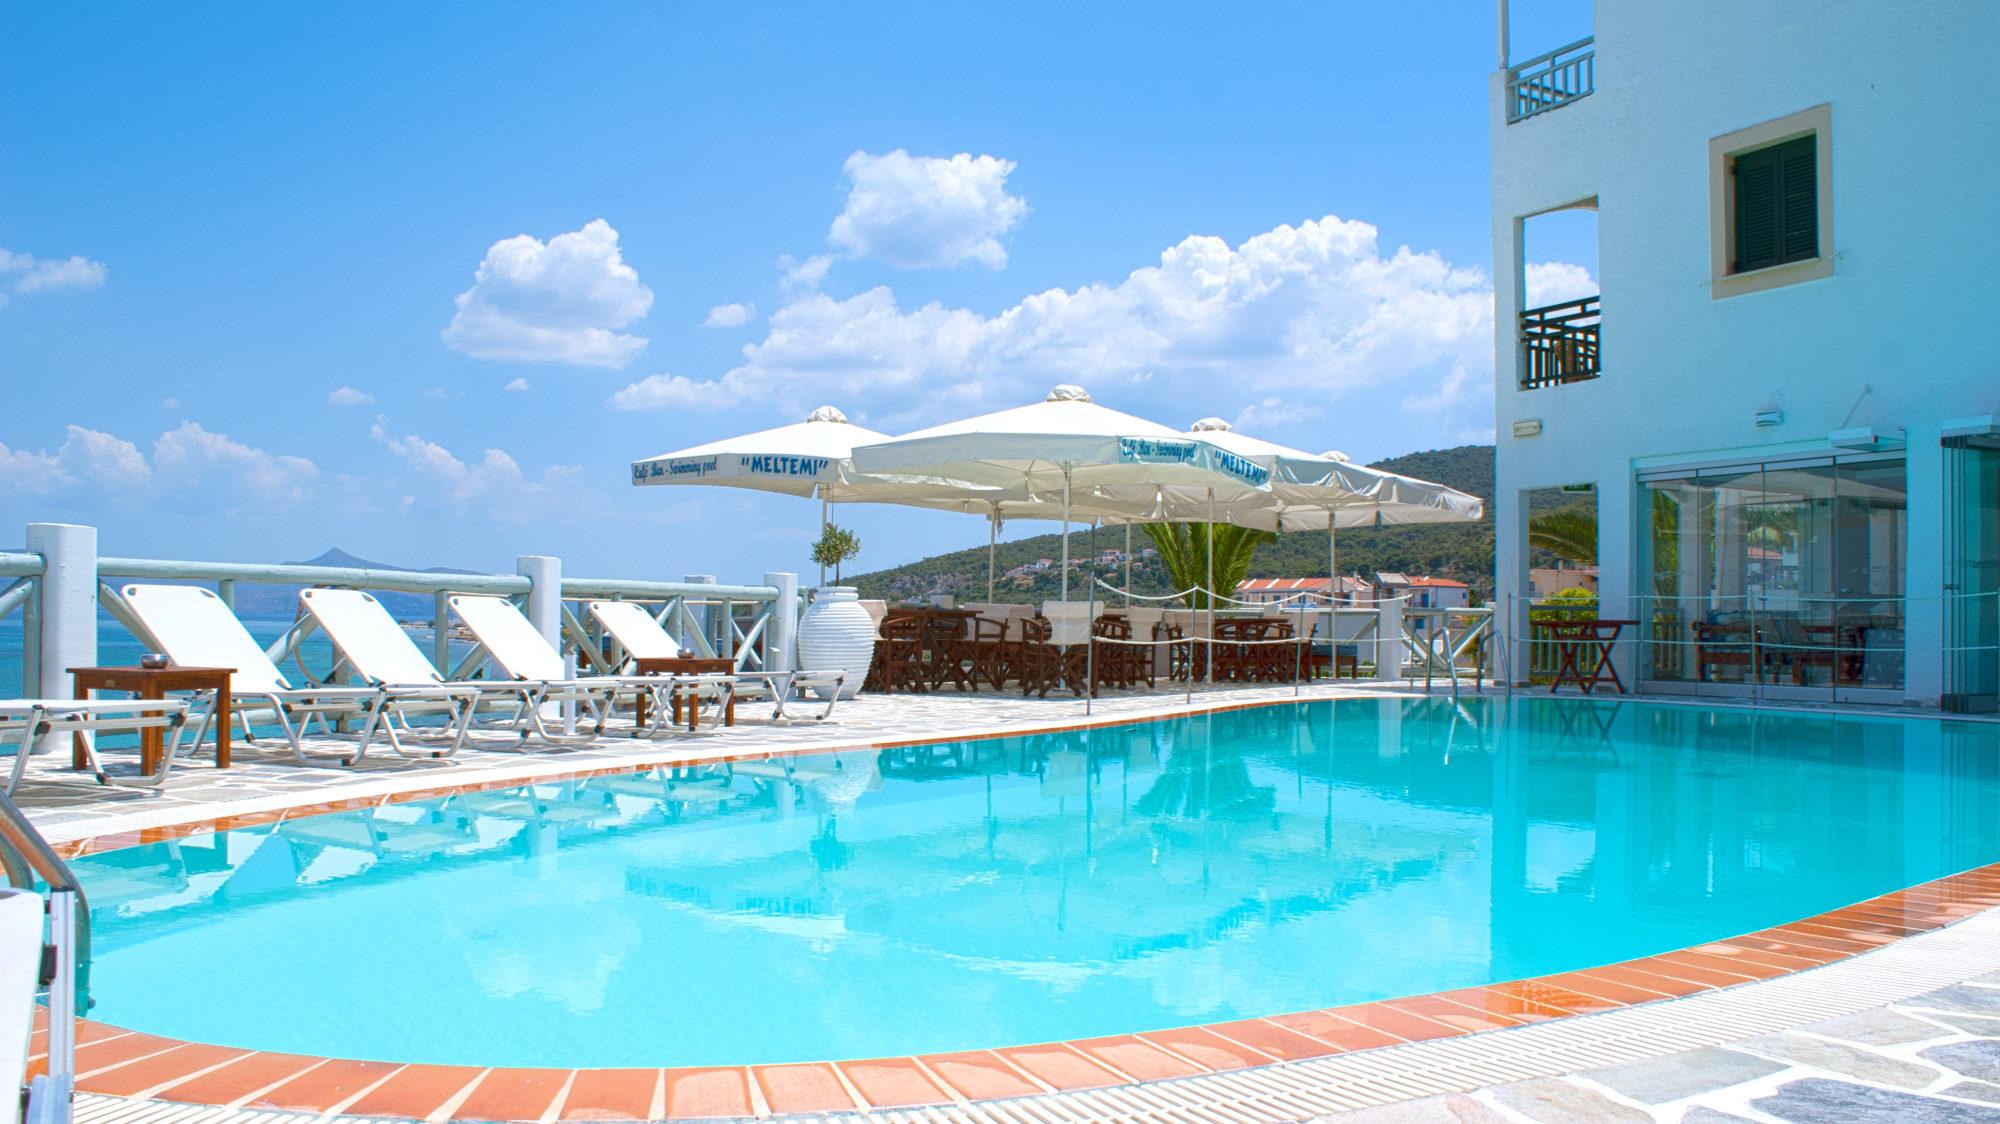 Meltemi hotel - pool bar – restaurant